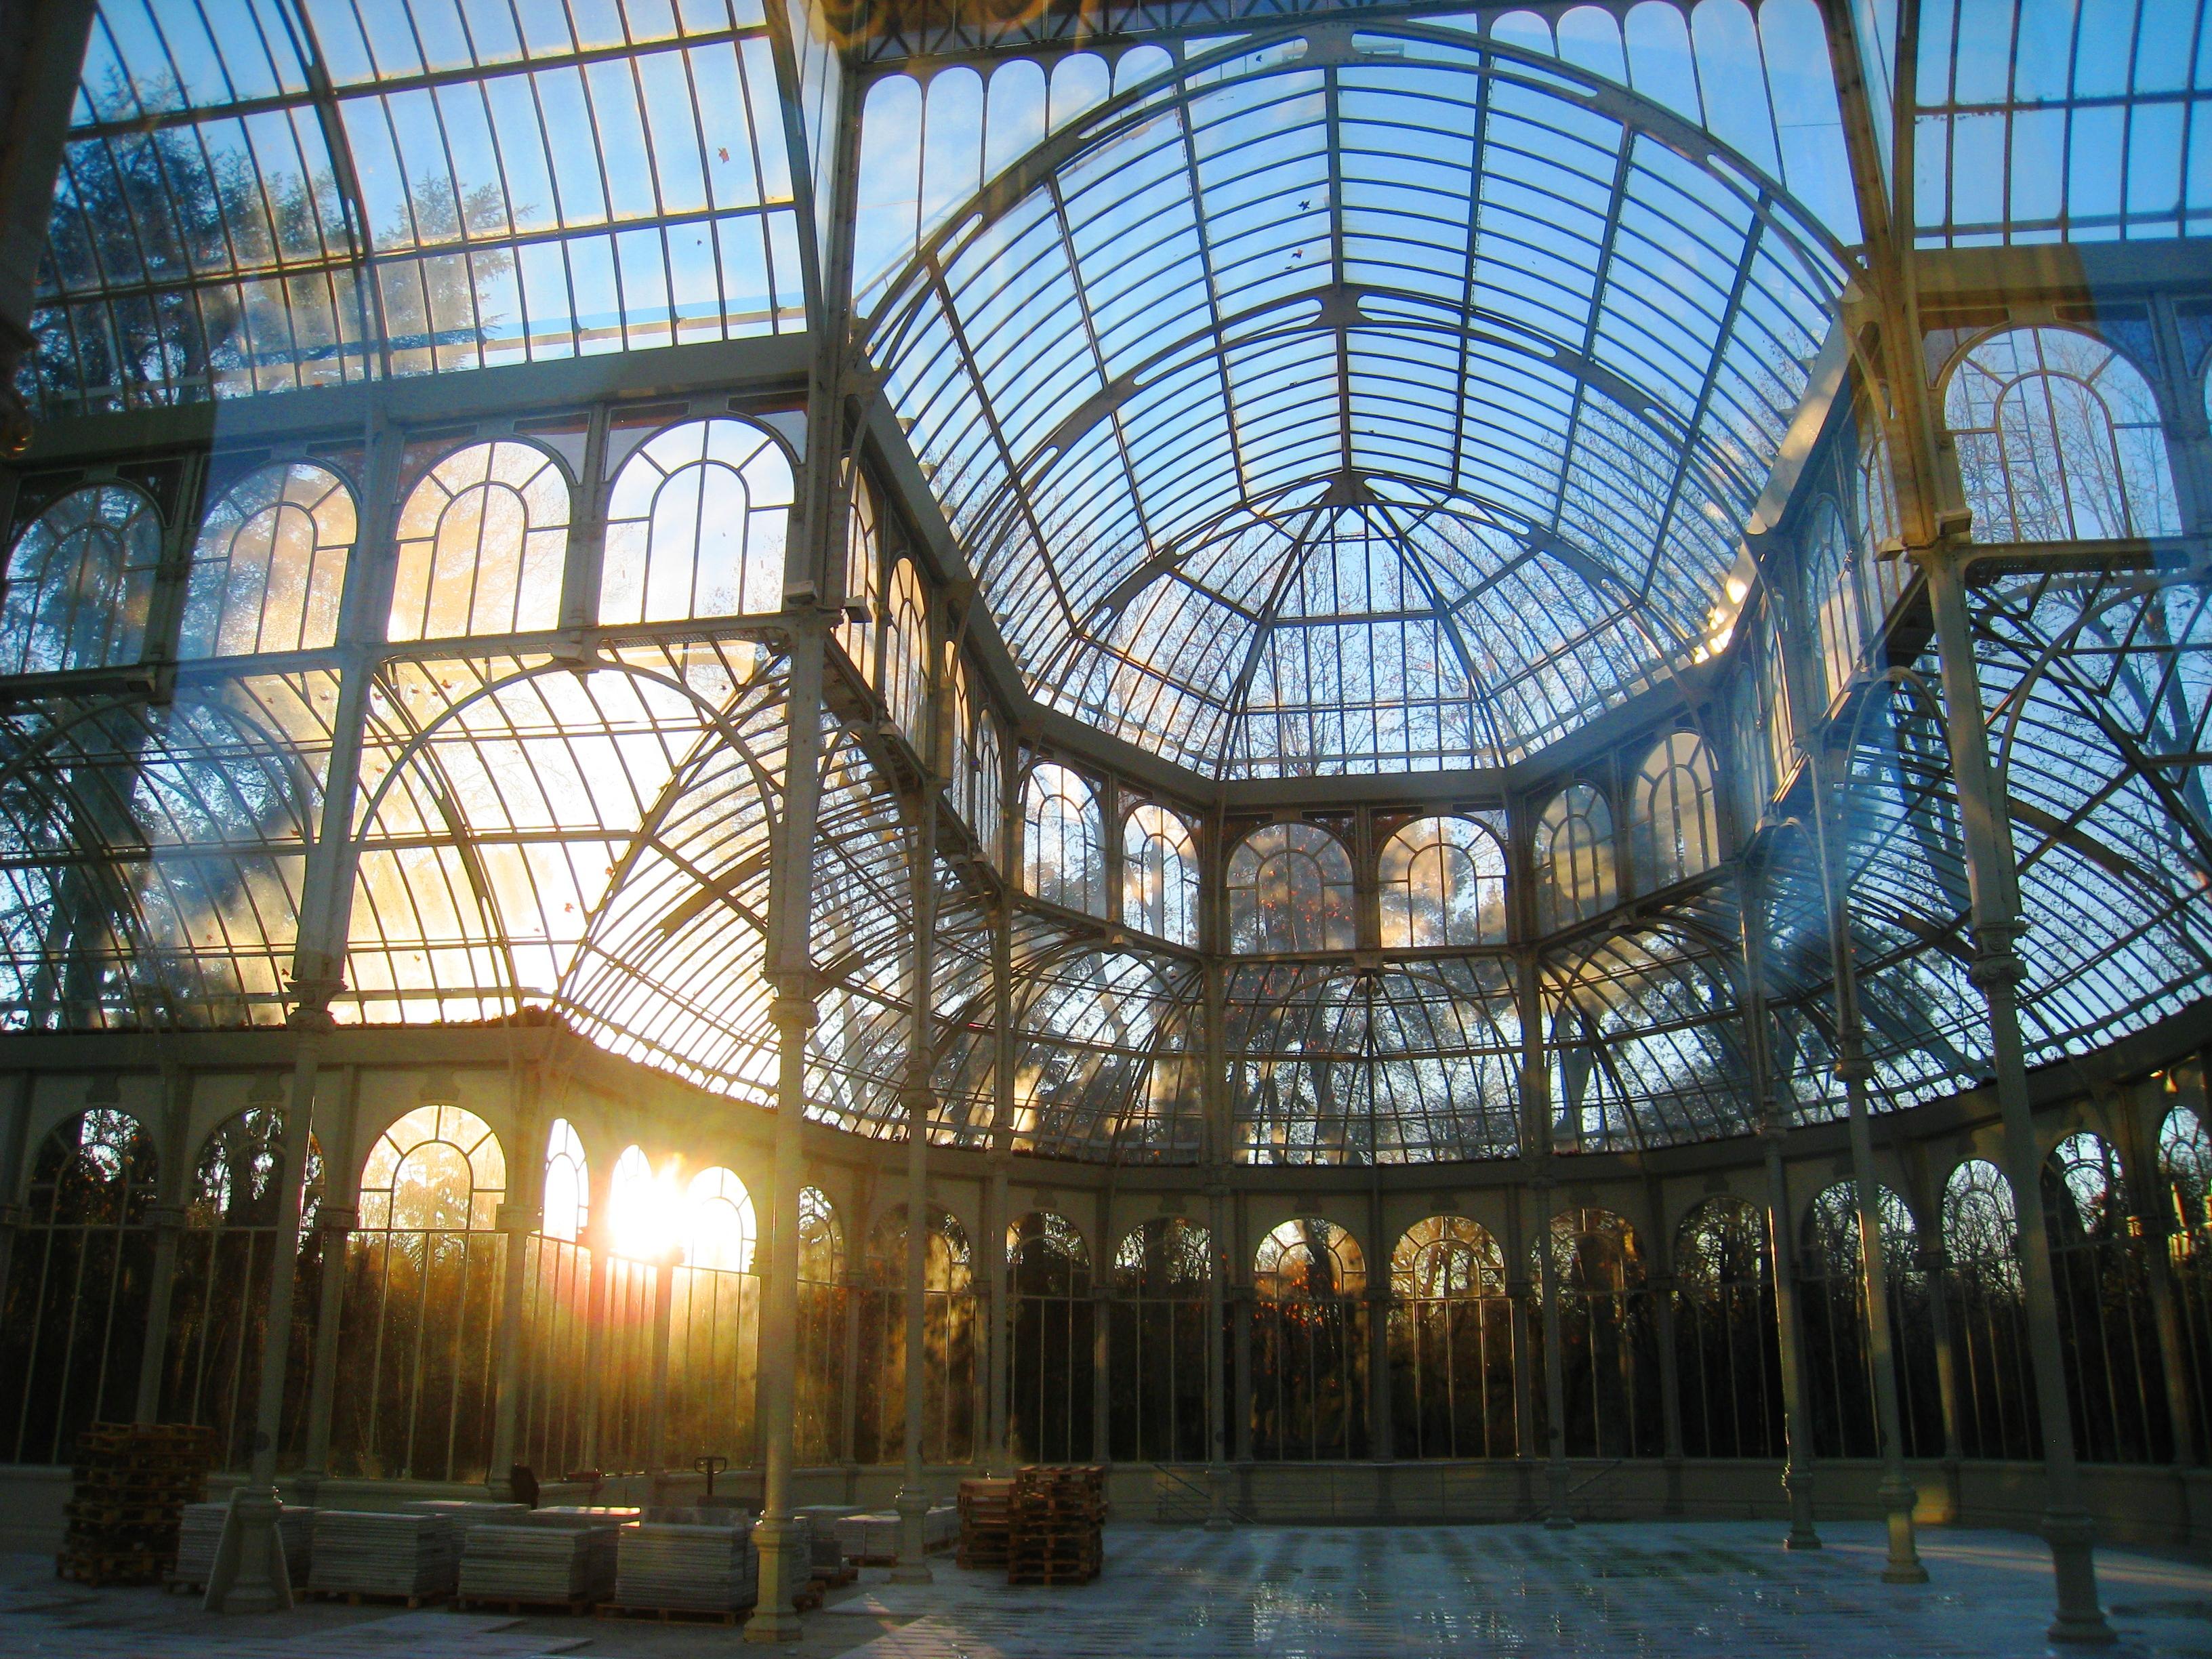 Parques Palacio_de_Cristal,_Parque_del_Buen_Retiro,_Madrid_-_interior